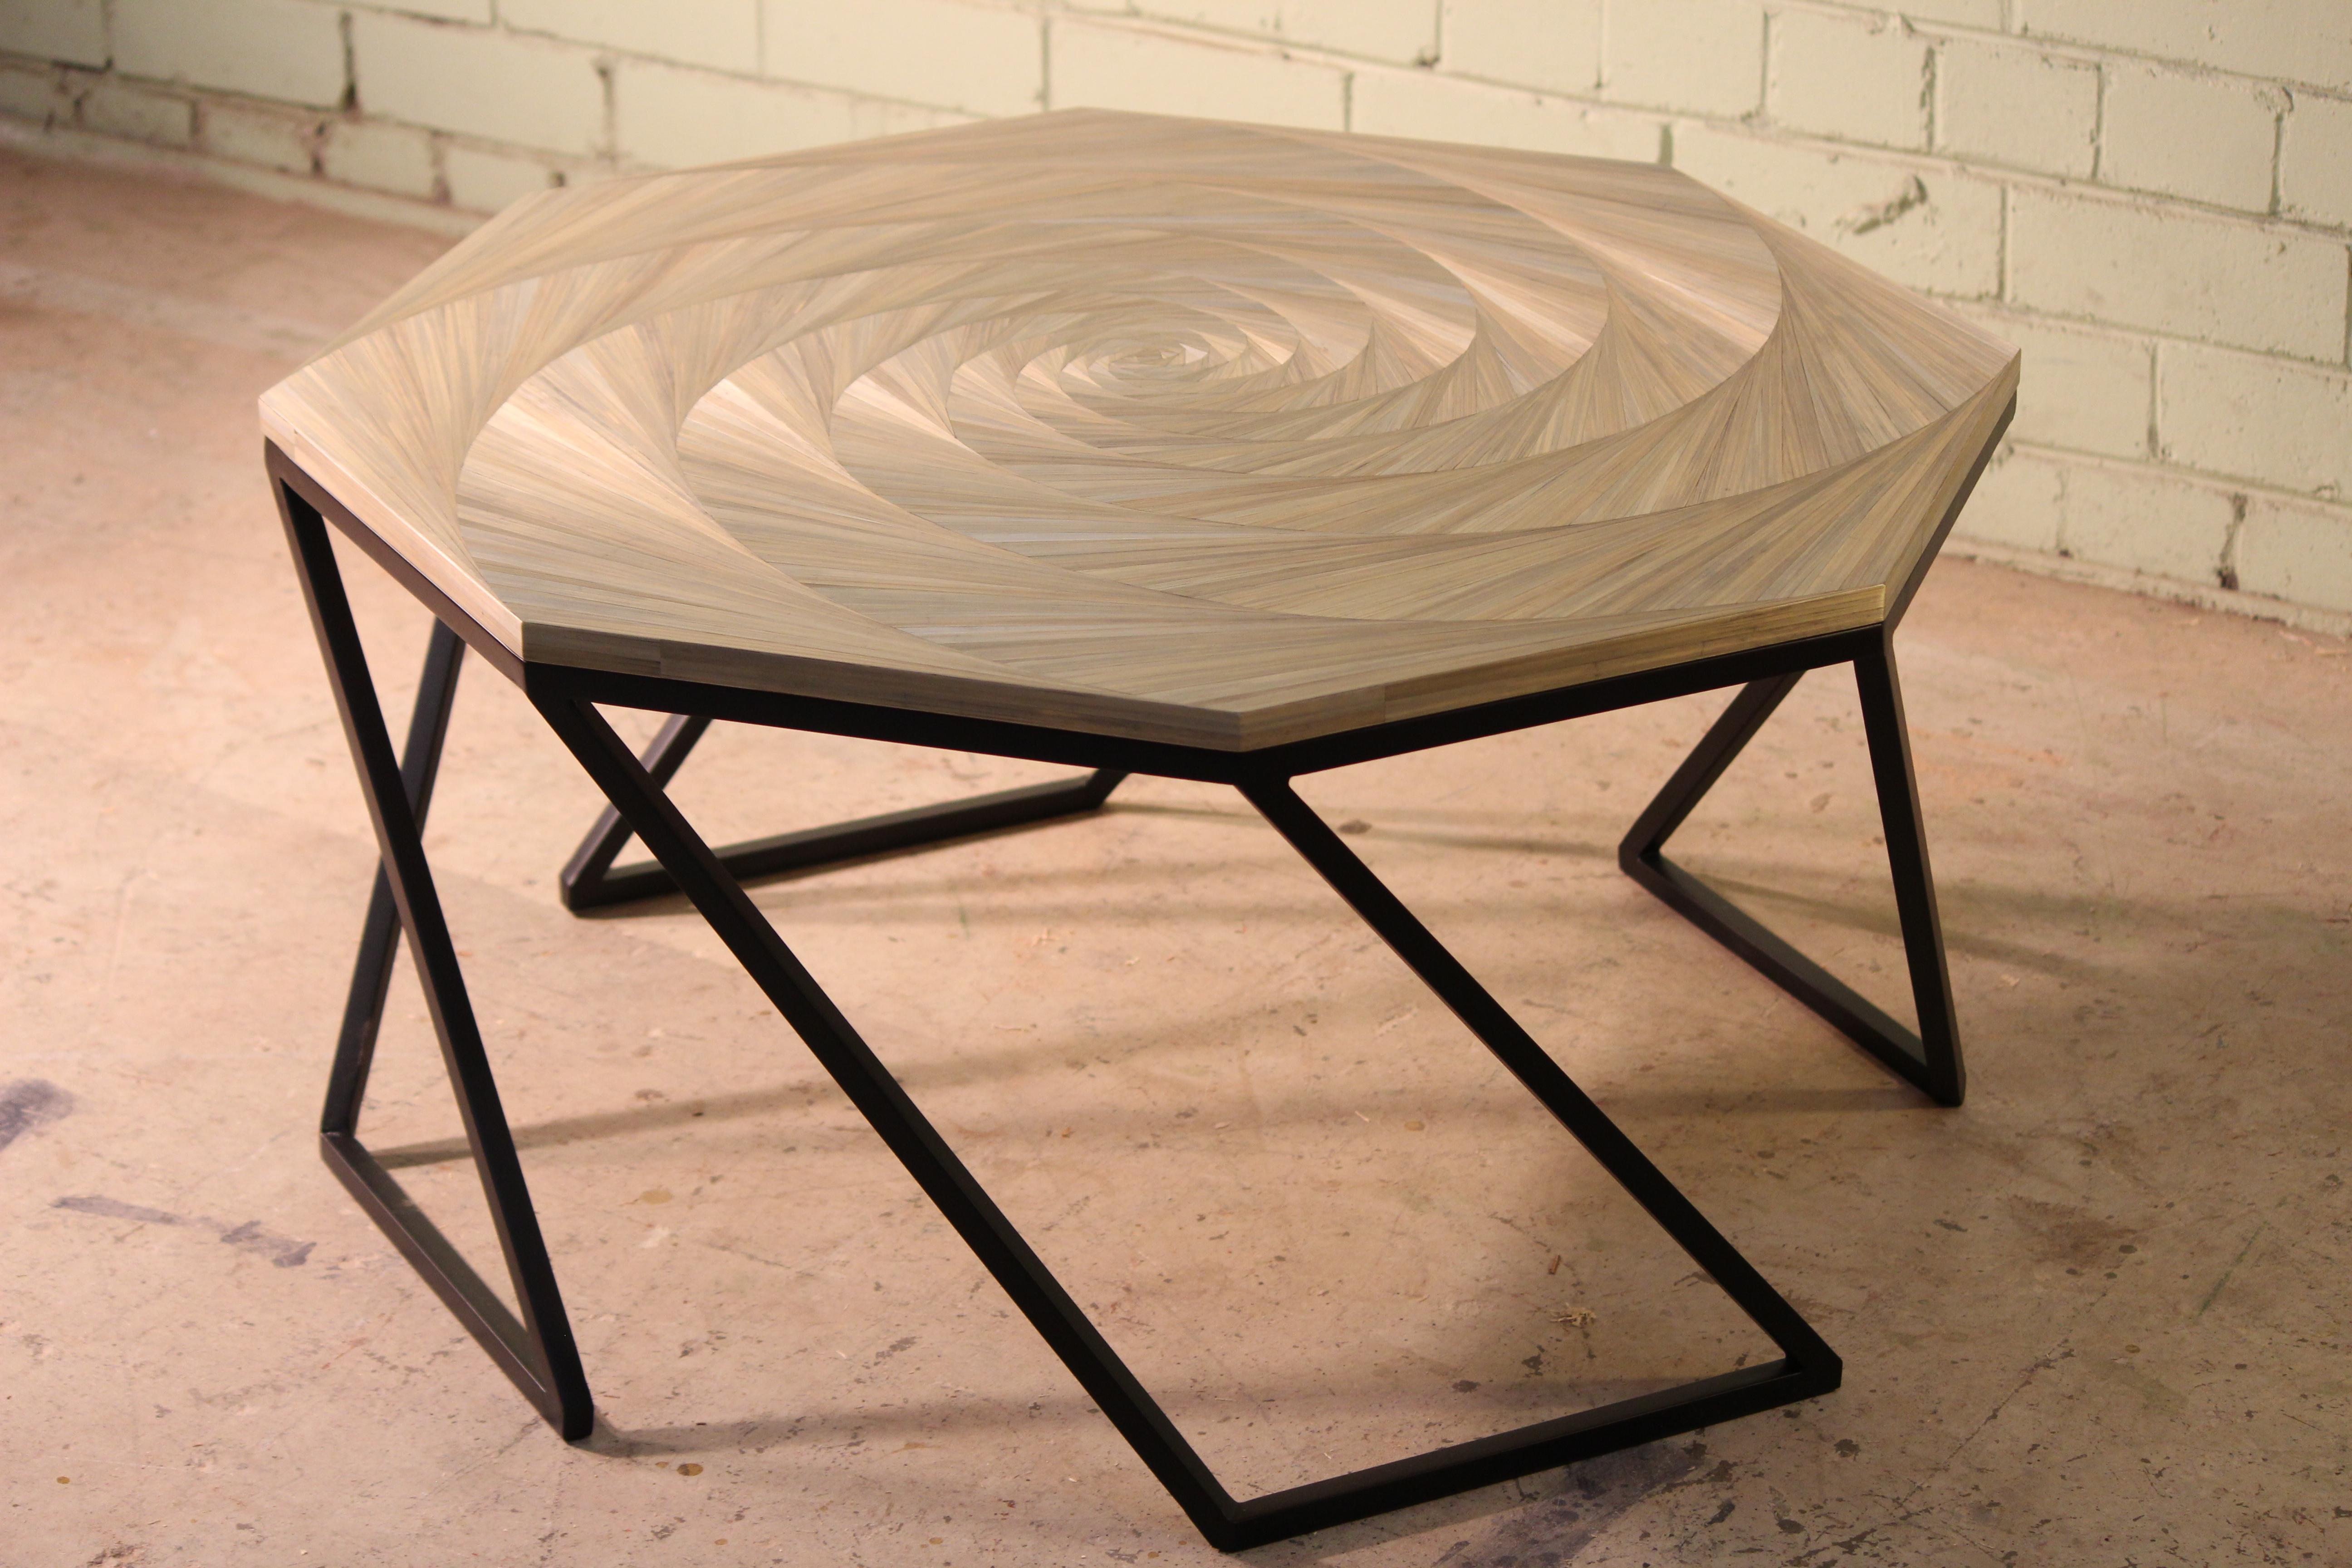 Vortex table by Arthur Seigneur.